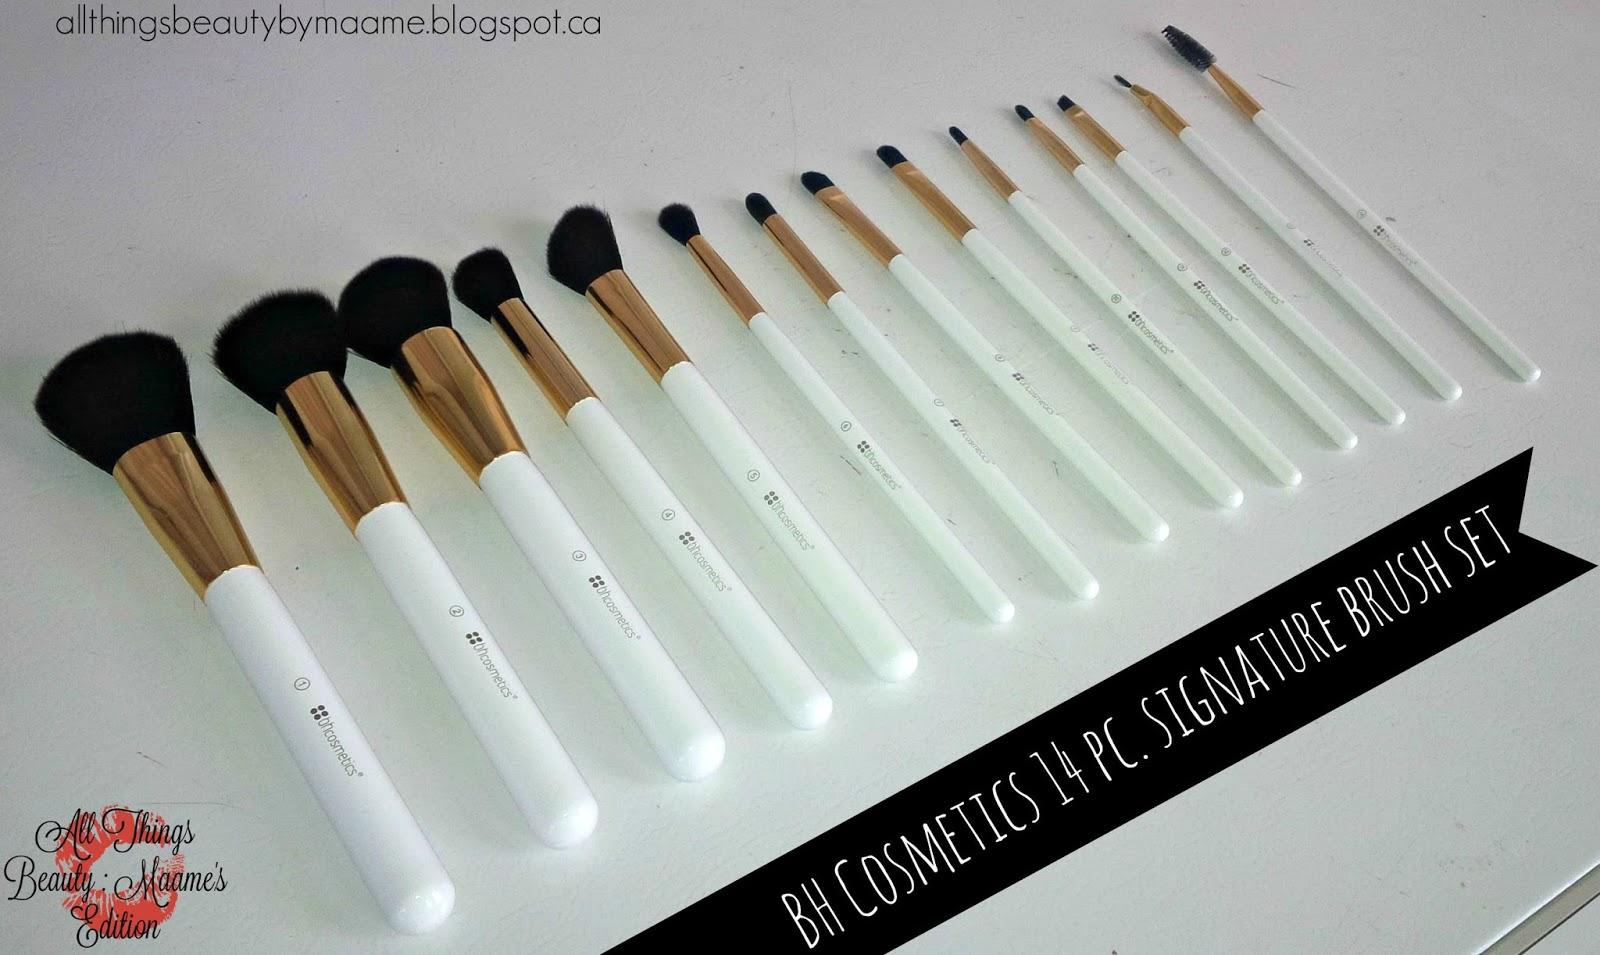 bh cosmetics eye brushes. budget beauty| bh cosmetics 14 pc. signature gold brush set bh eye brushes r